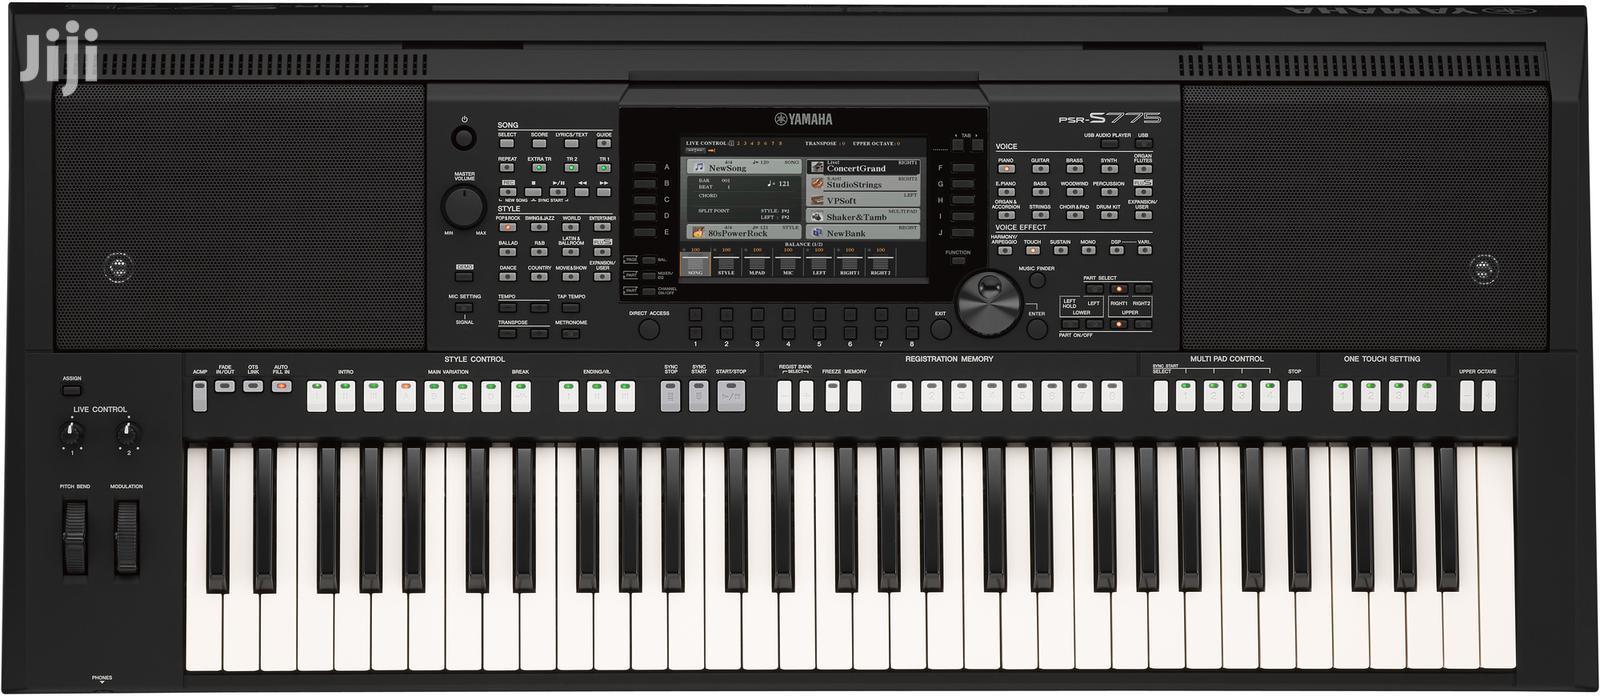 Archive: Psrs-s775 Yamaha